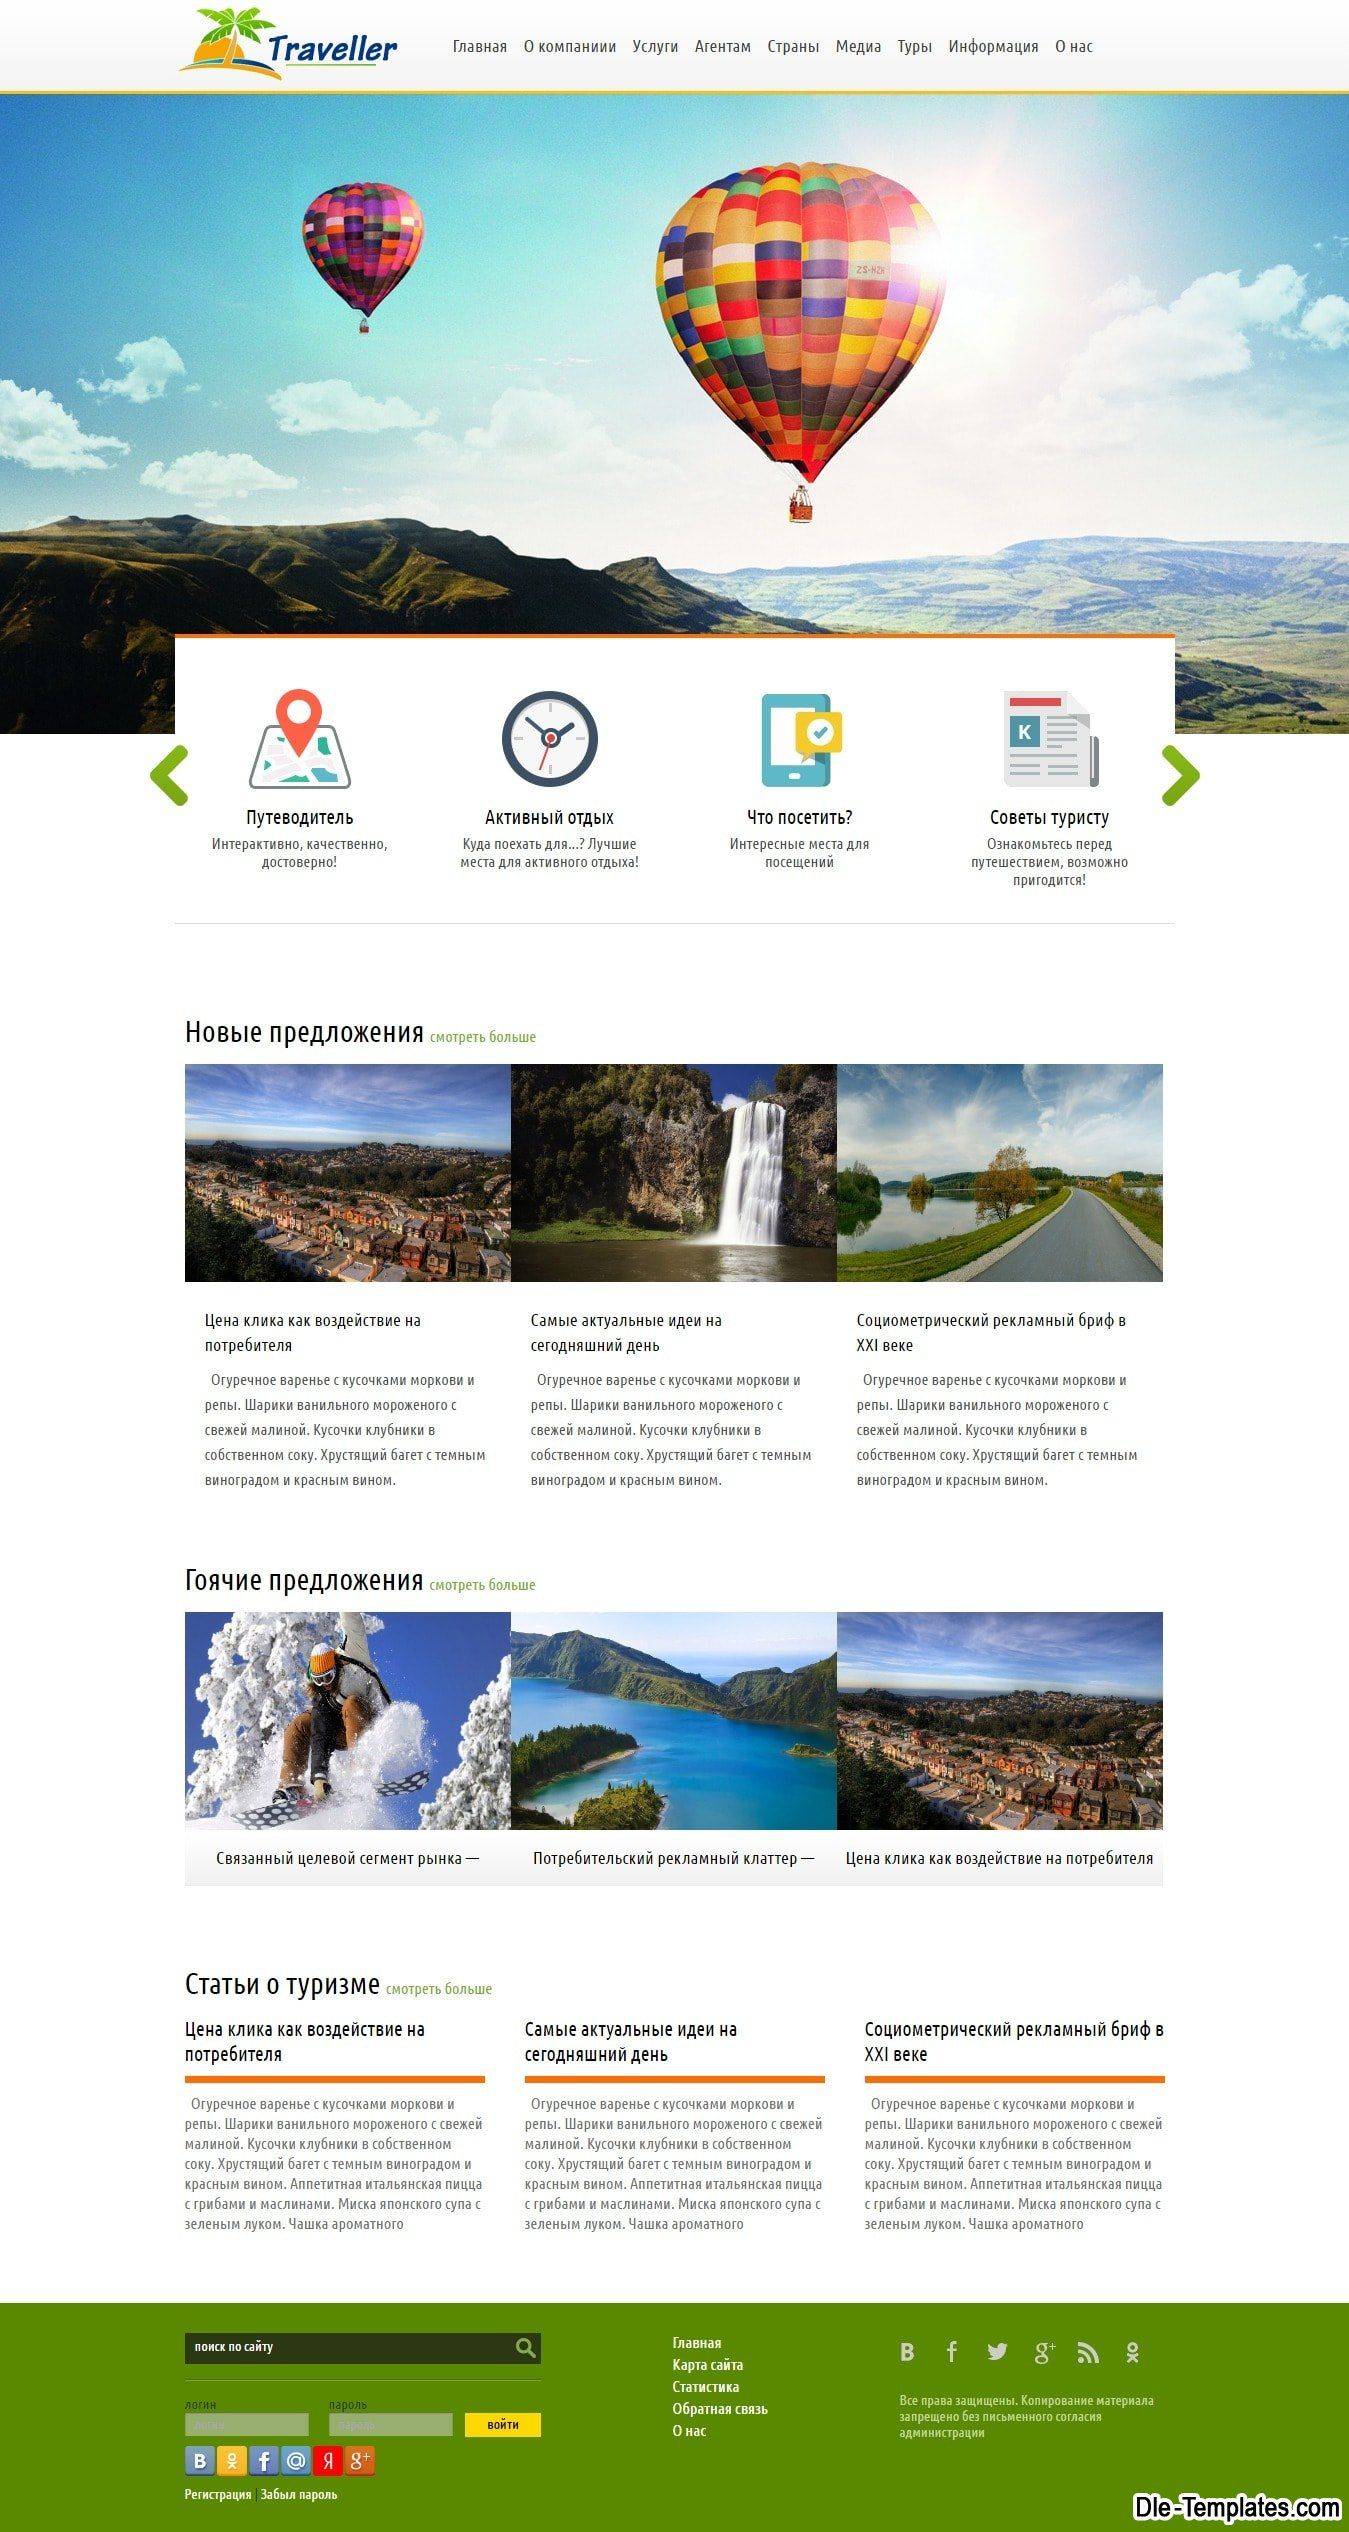 Traveller - адаптивный туристический шаблон для DLE | Pinterest ...